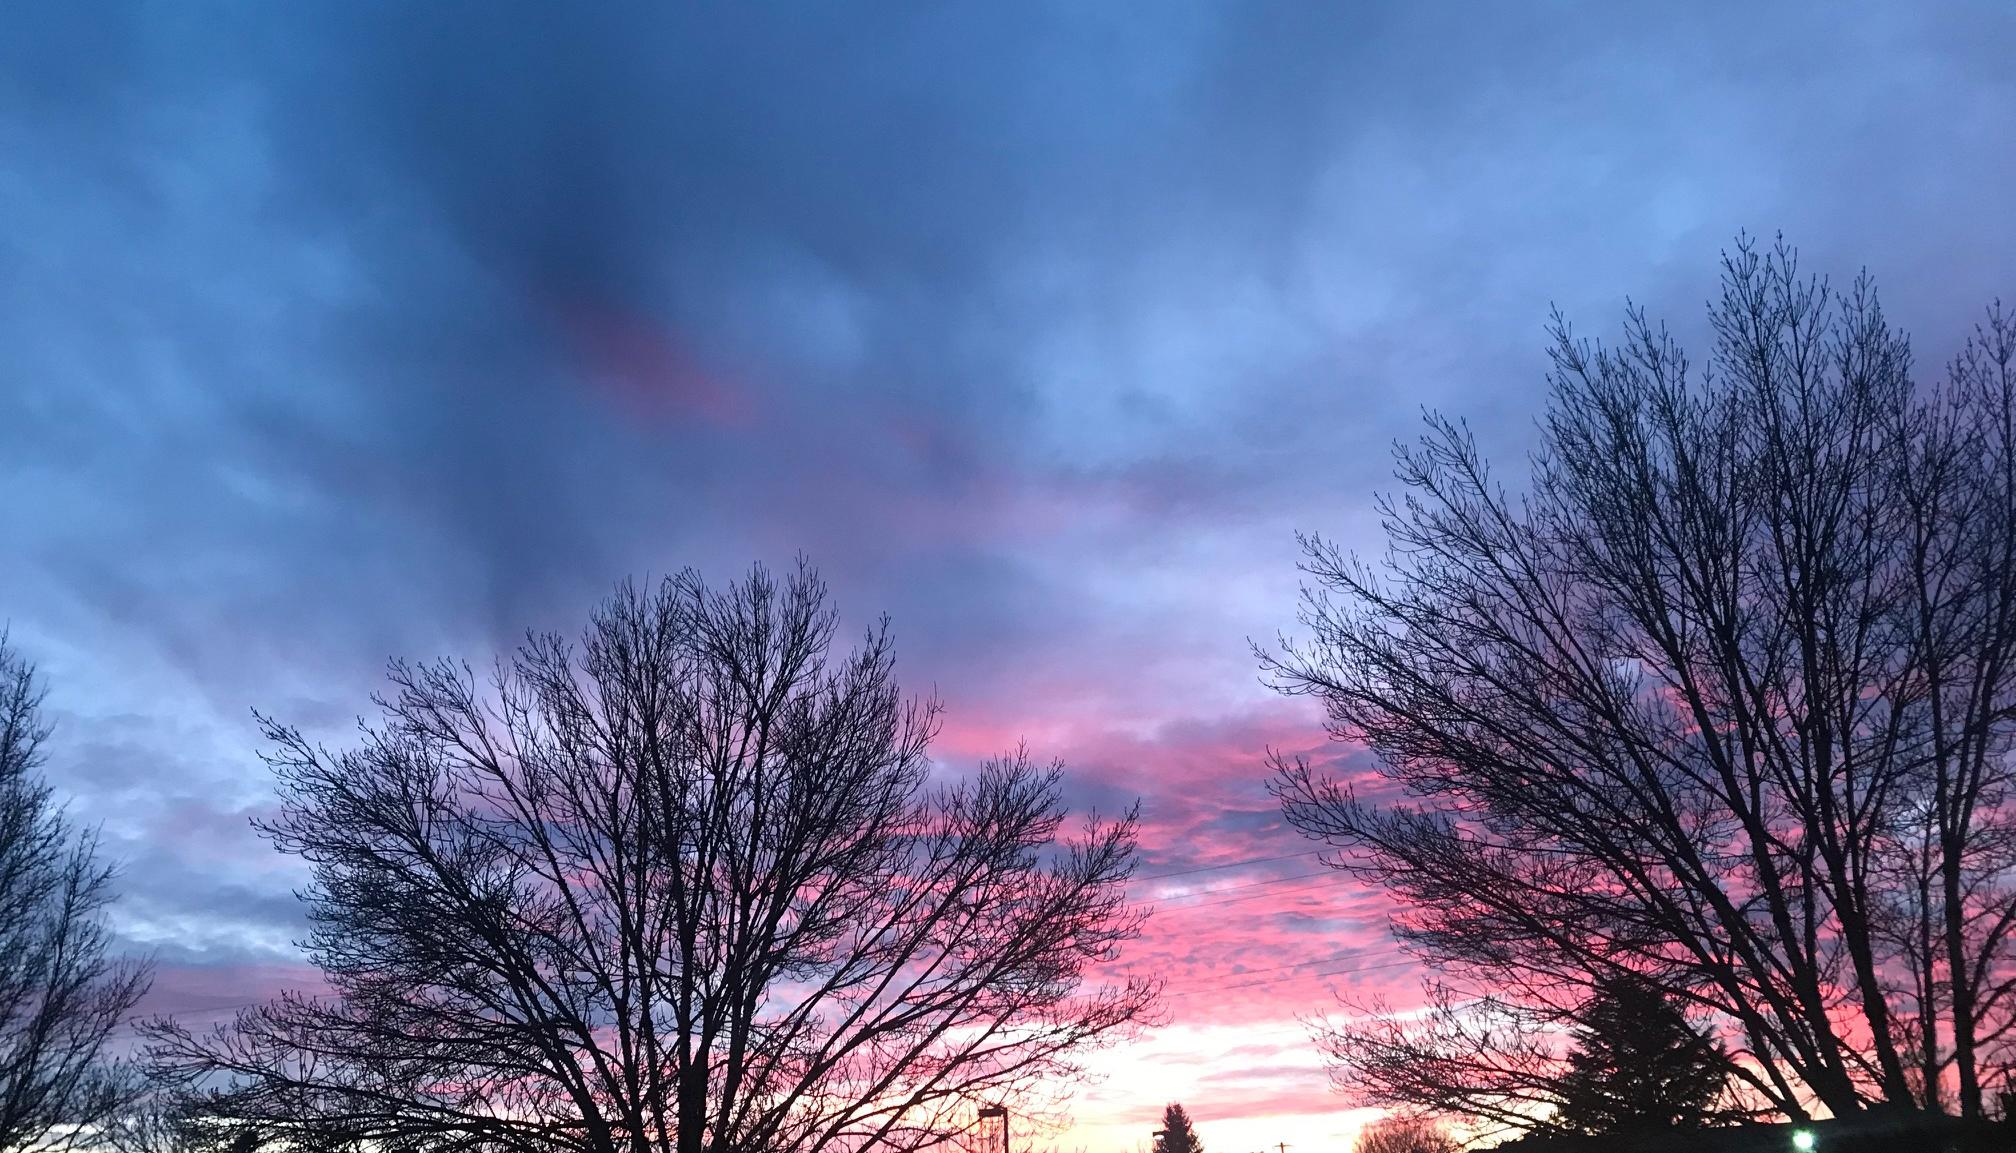 Sunset-in-corvallis.jpg